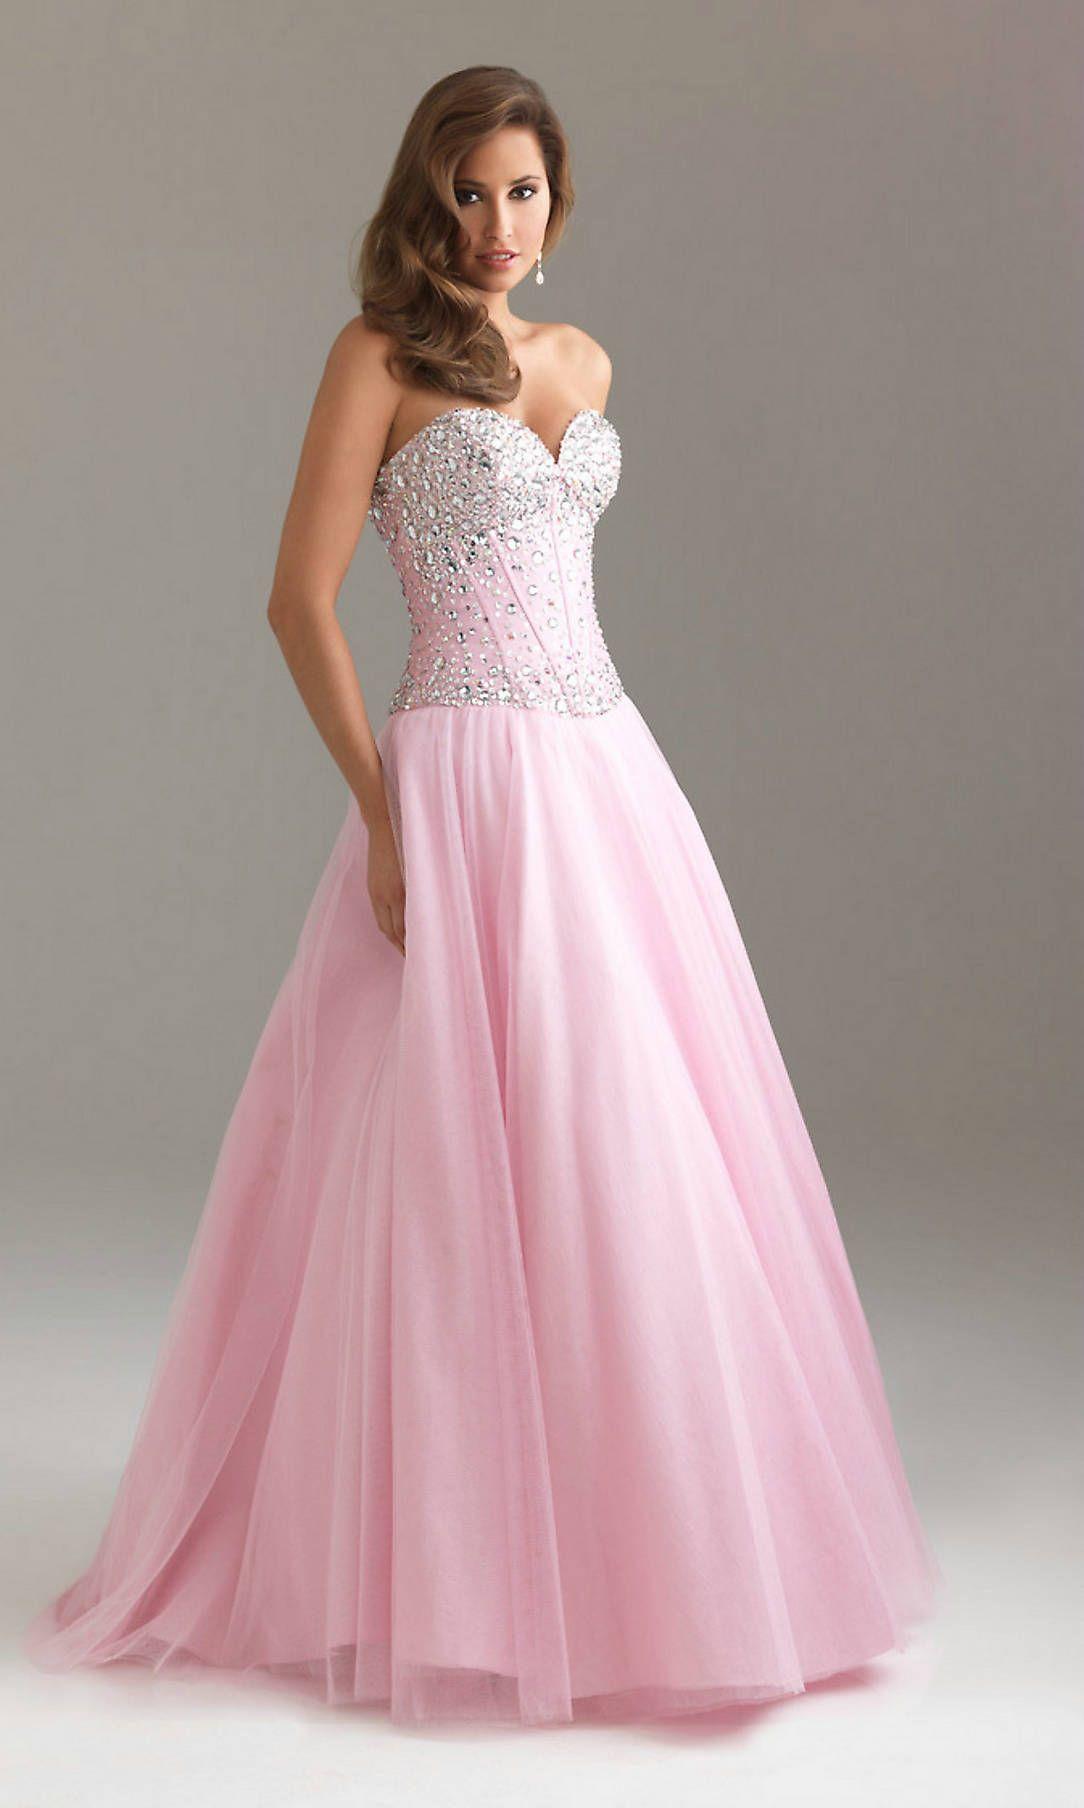 Pin de Rachel Wood en Prom Dresses | Pinterest | Rosas, Vestido de ...